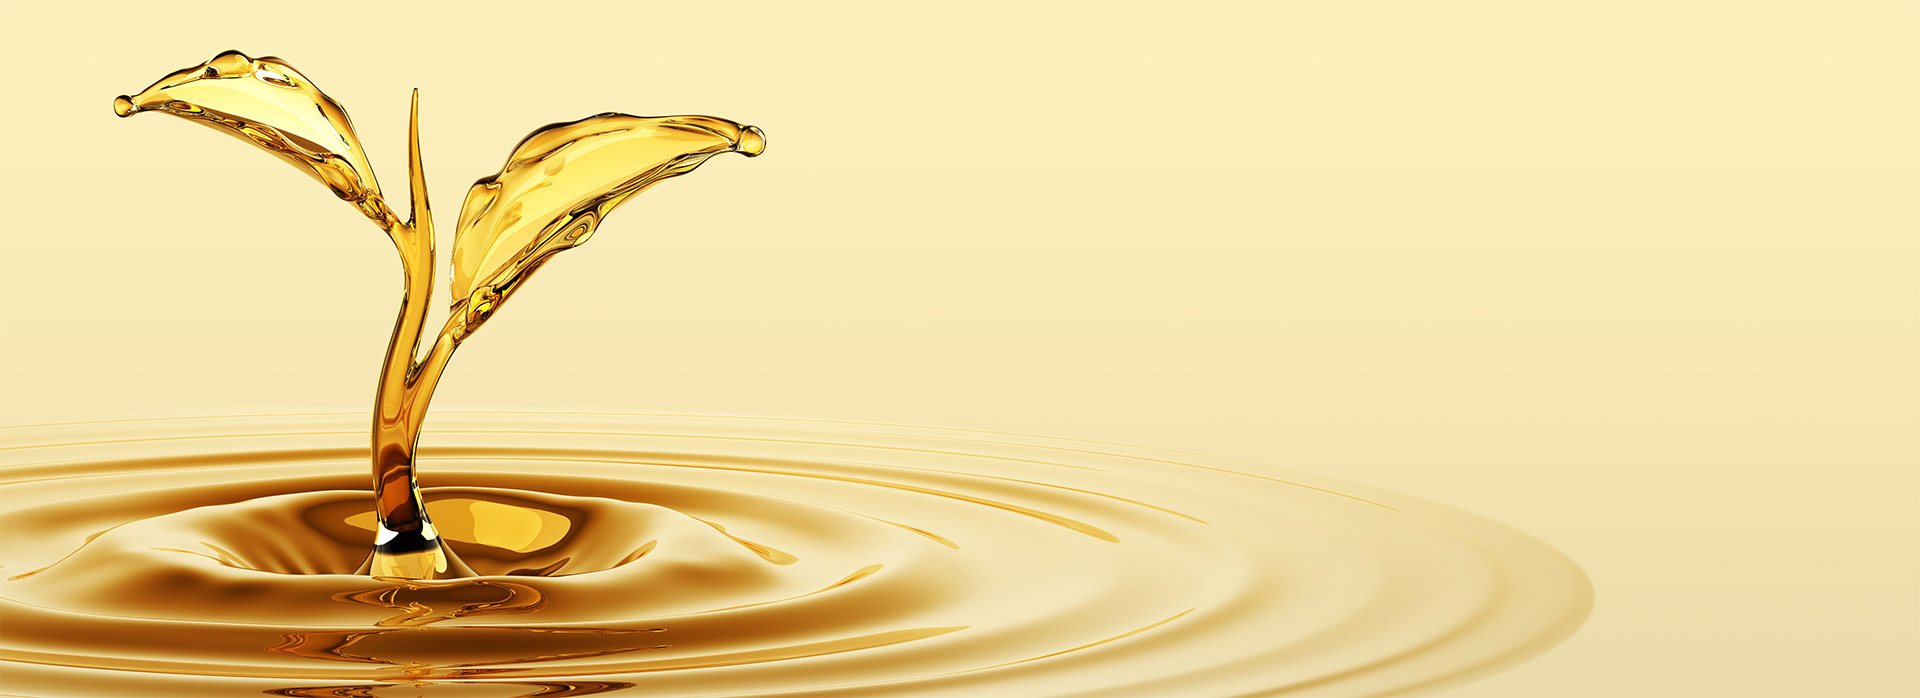 Recogida de aceite usado hosteleria granada